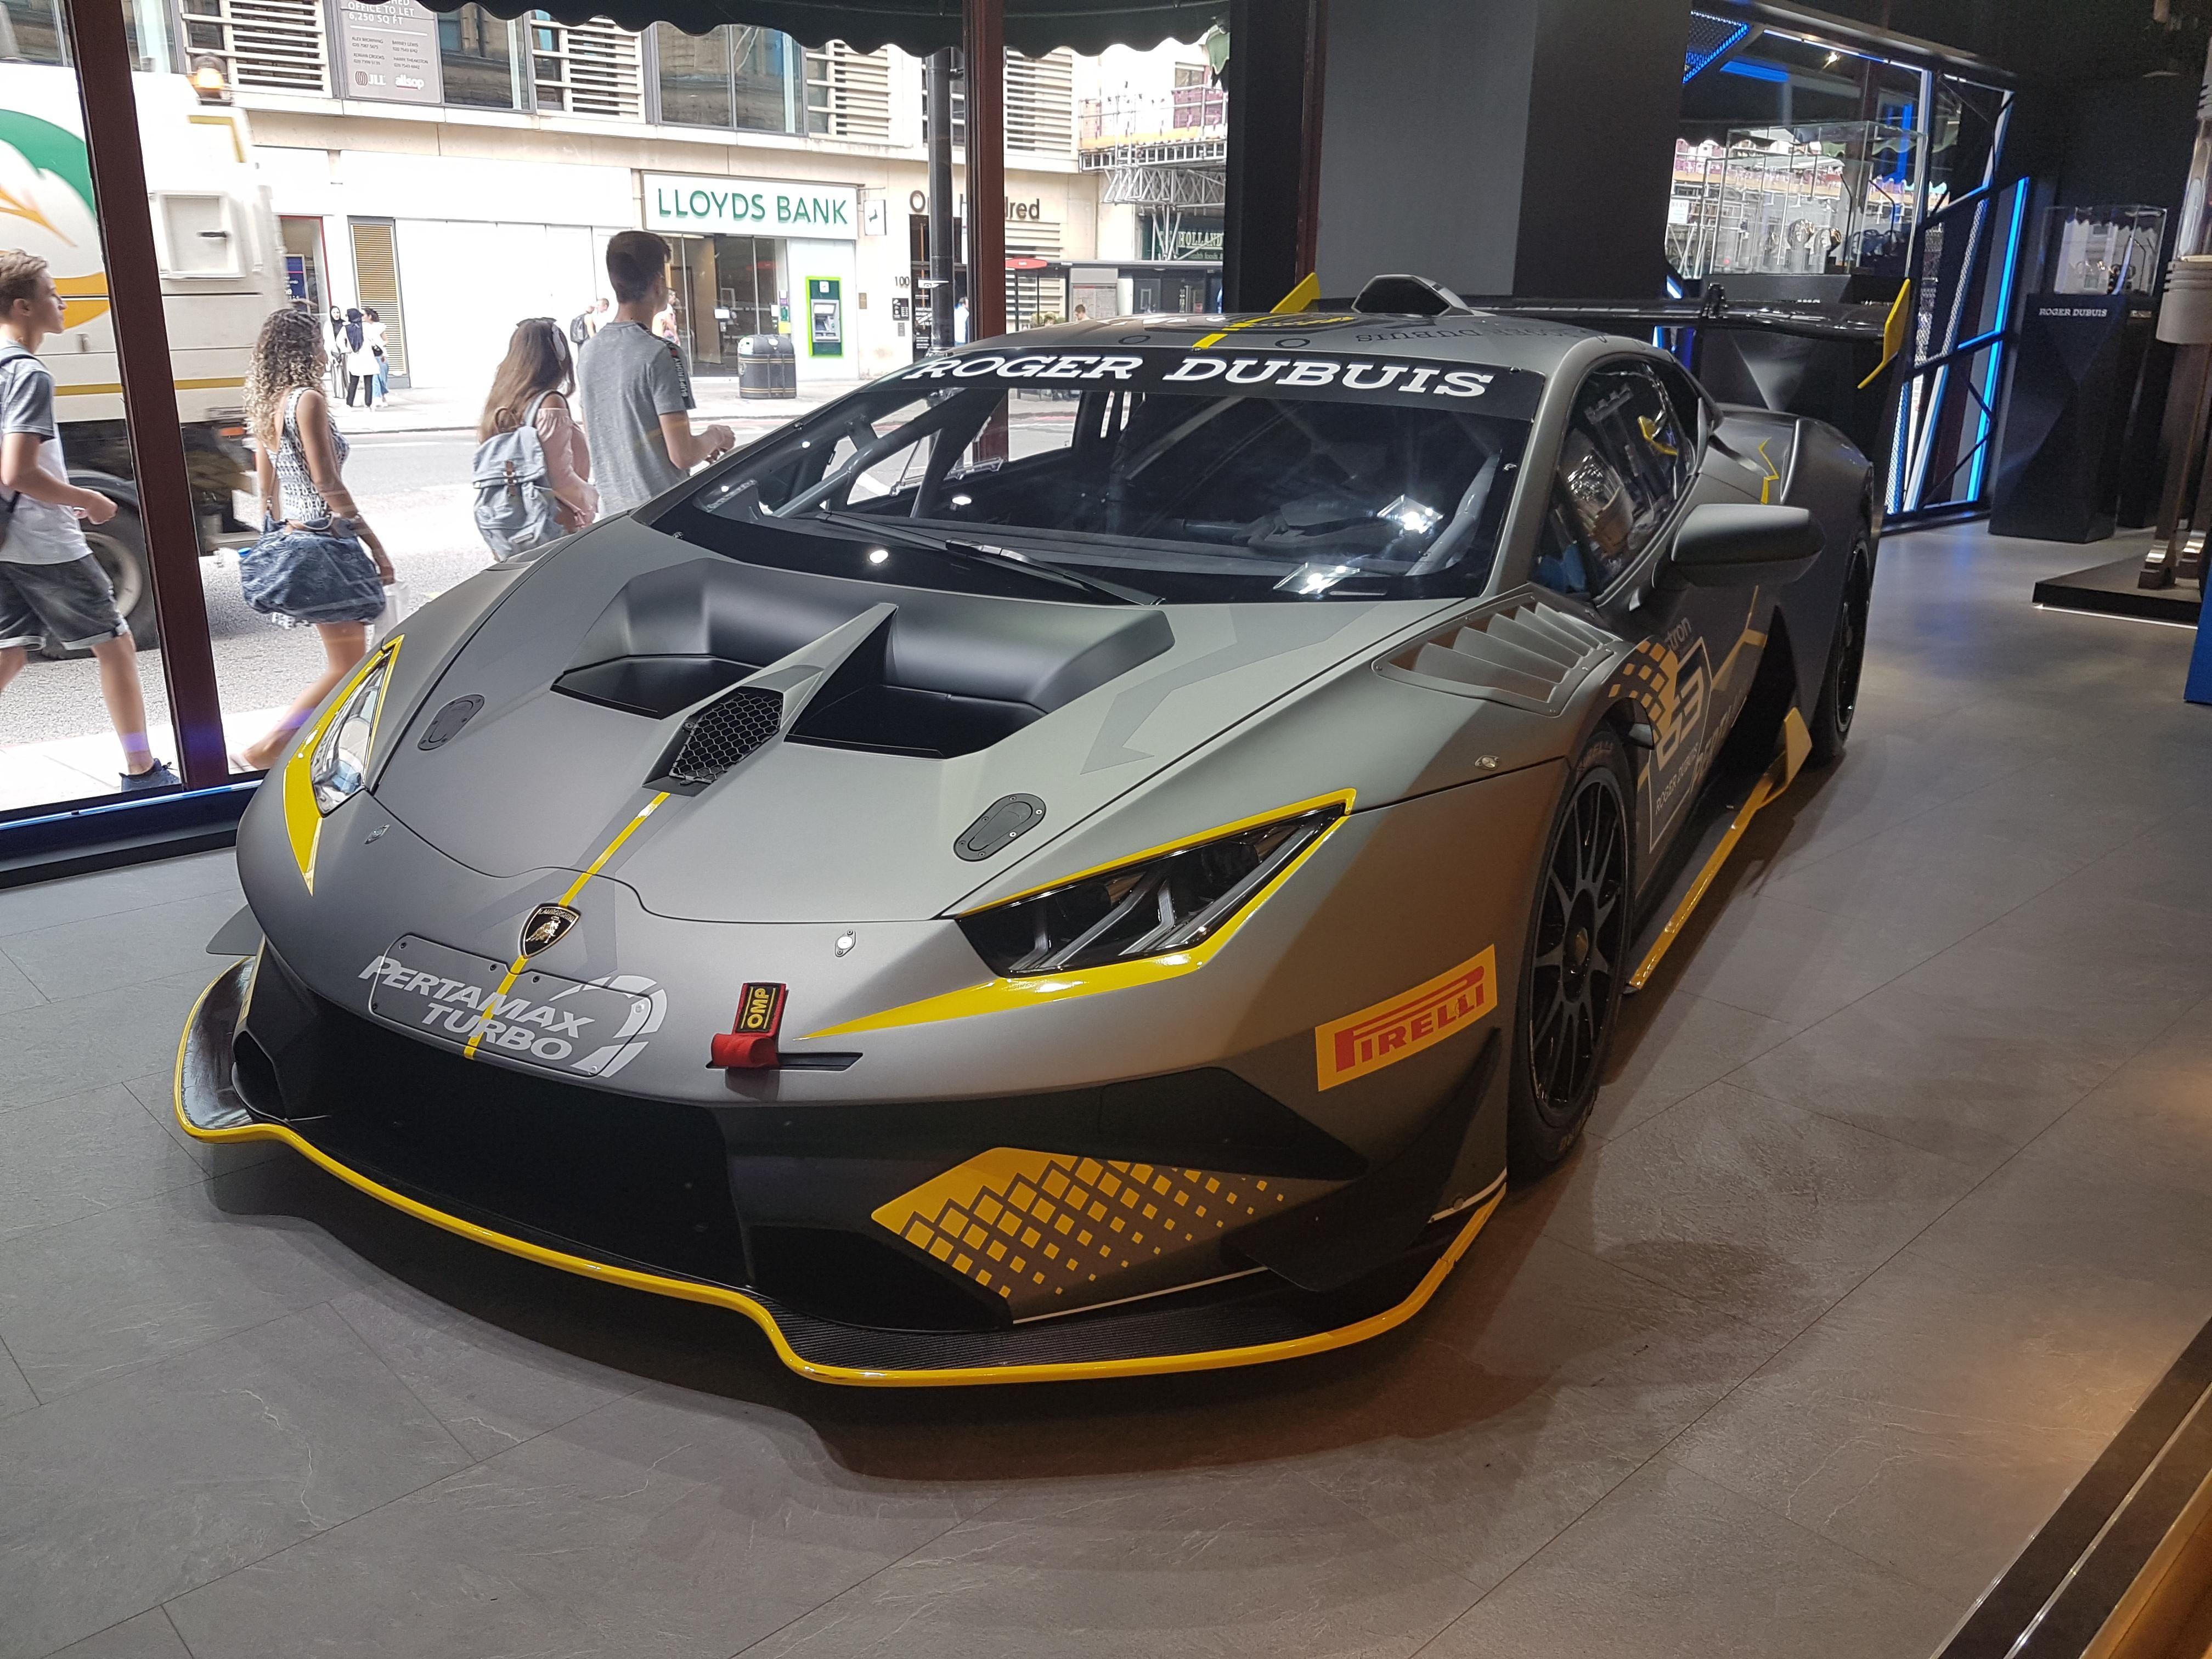 Just Saw This Nice Lamborghini Oc Lamborghini Luxury Cars Cars